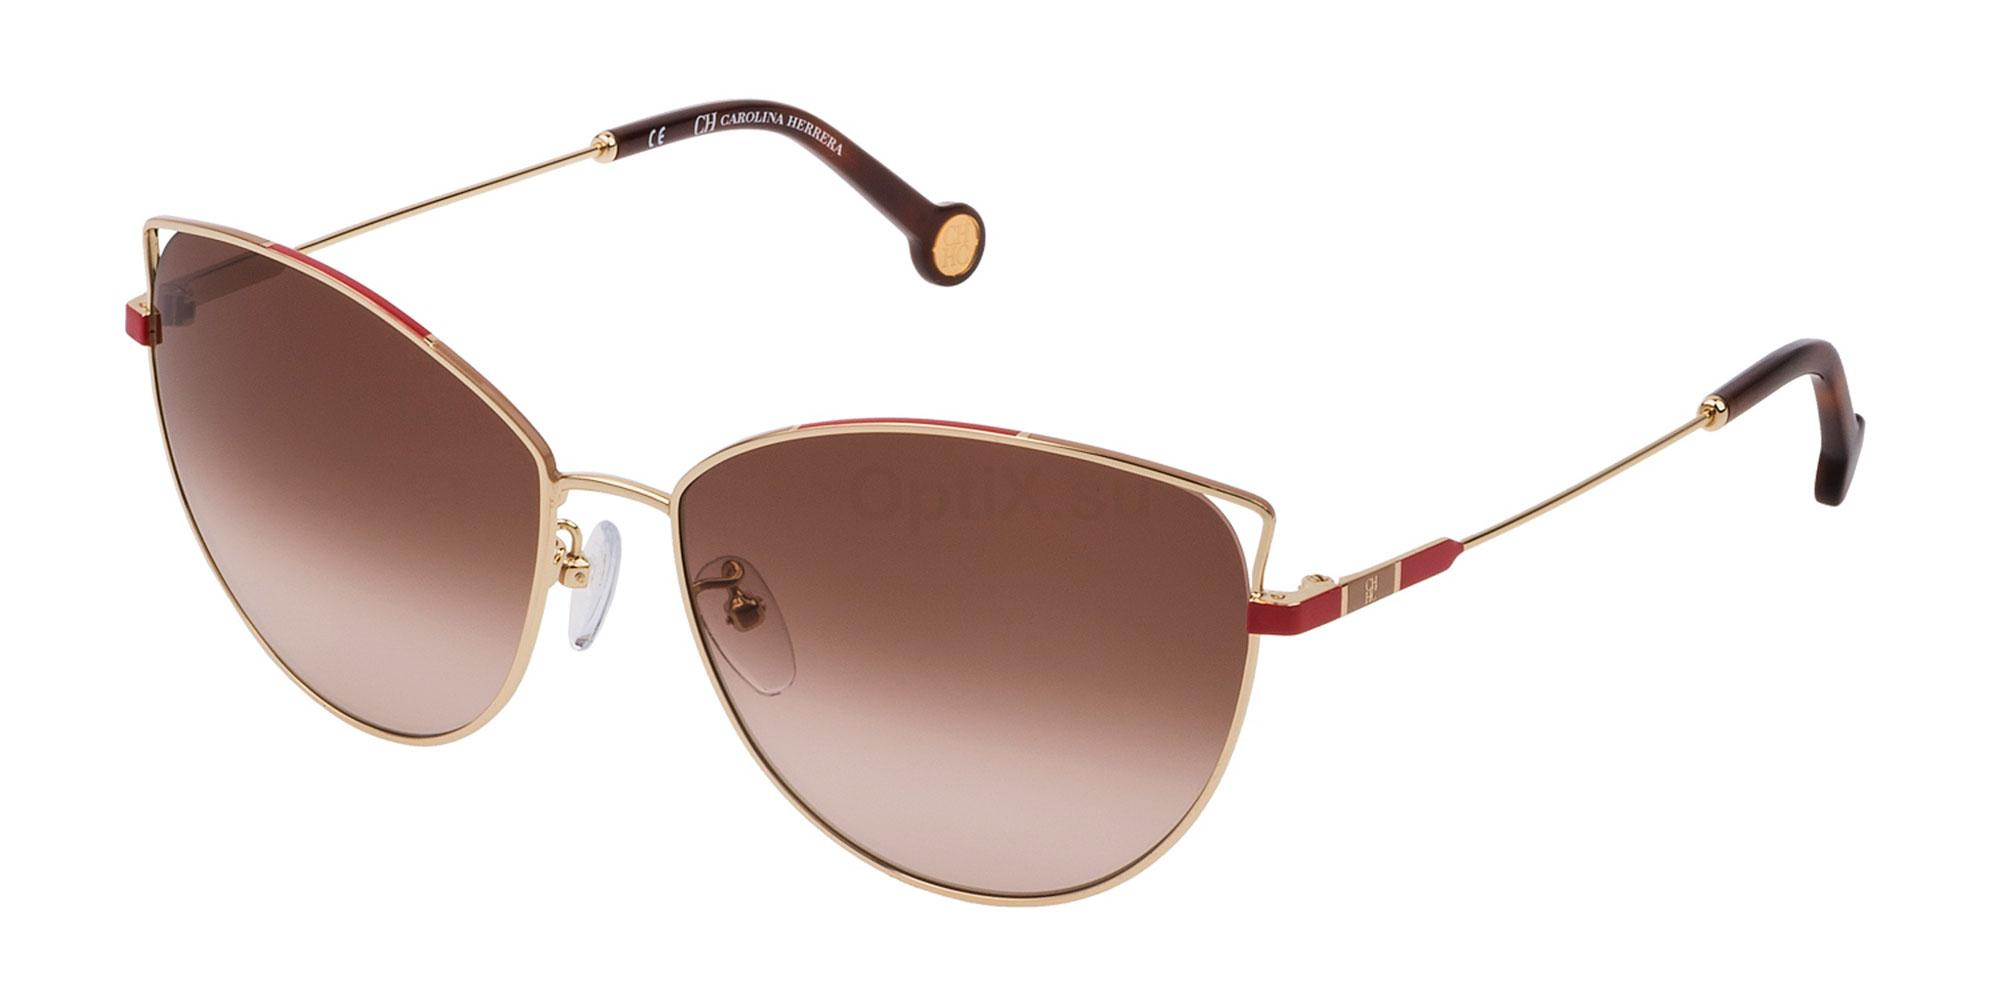 0300 SHE140 Sunglasses, CH Carolina Herrera